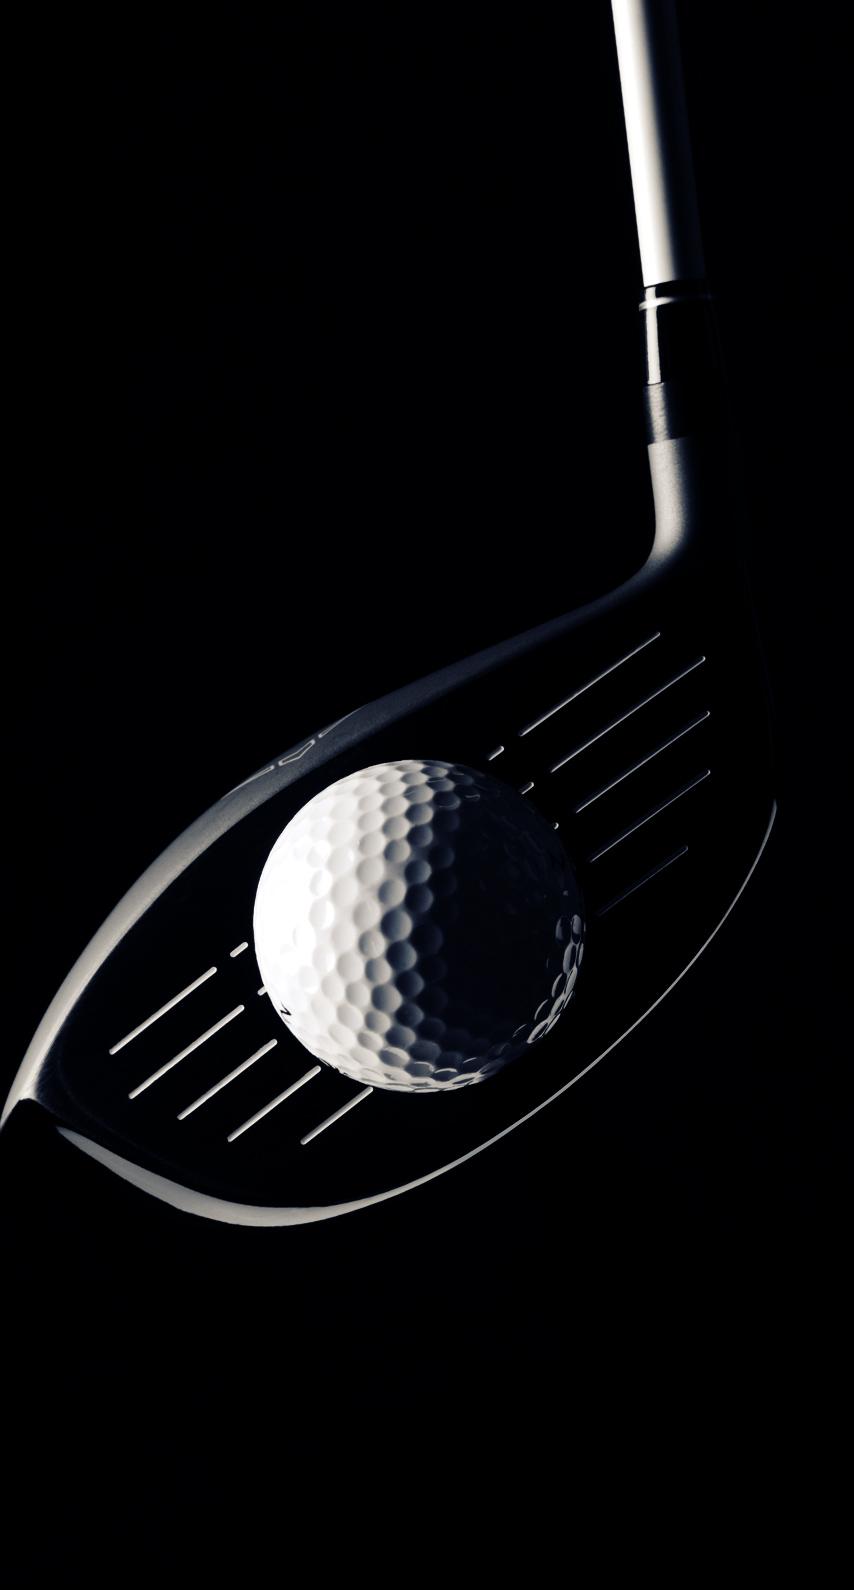 monochrome, equipment, chrome, sport, leisure, participate